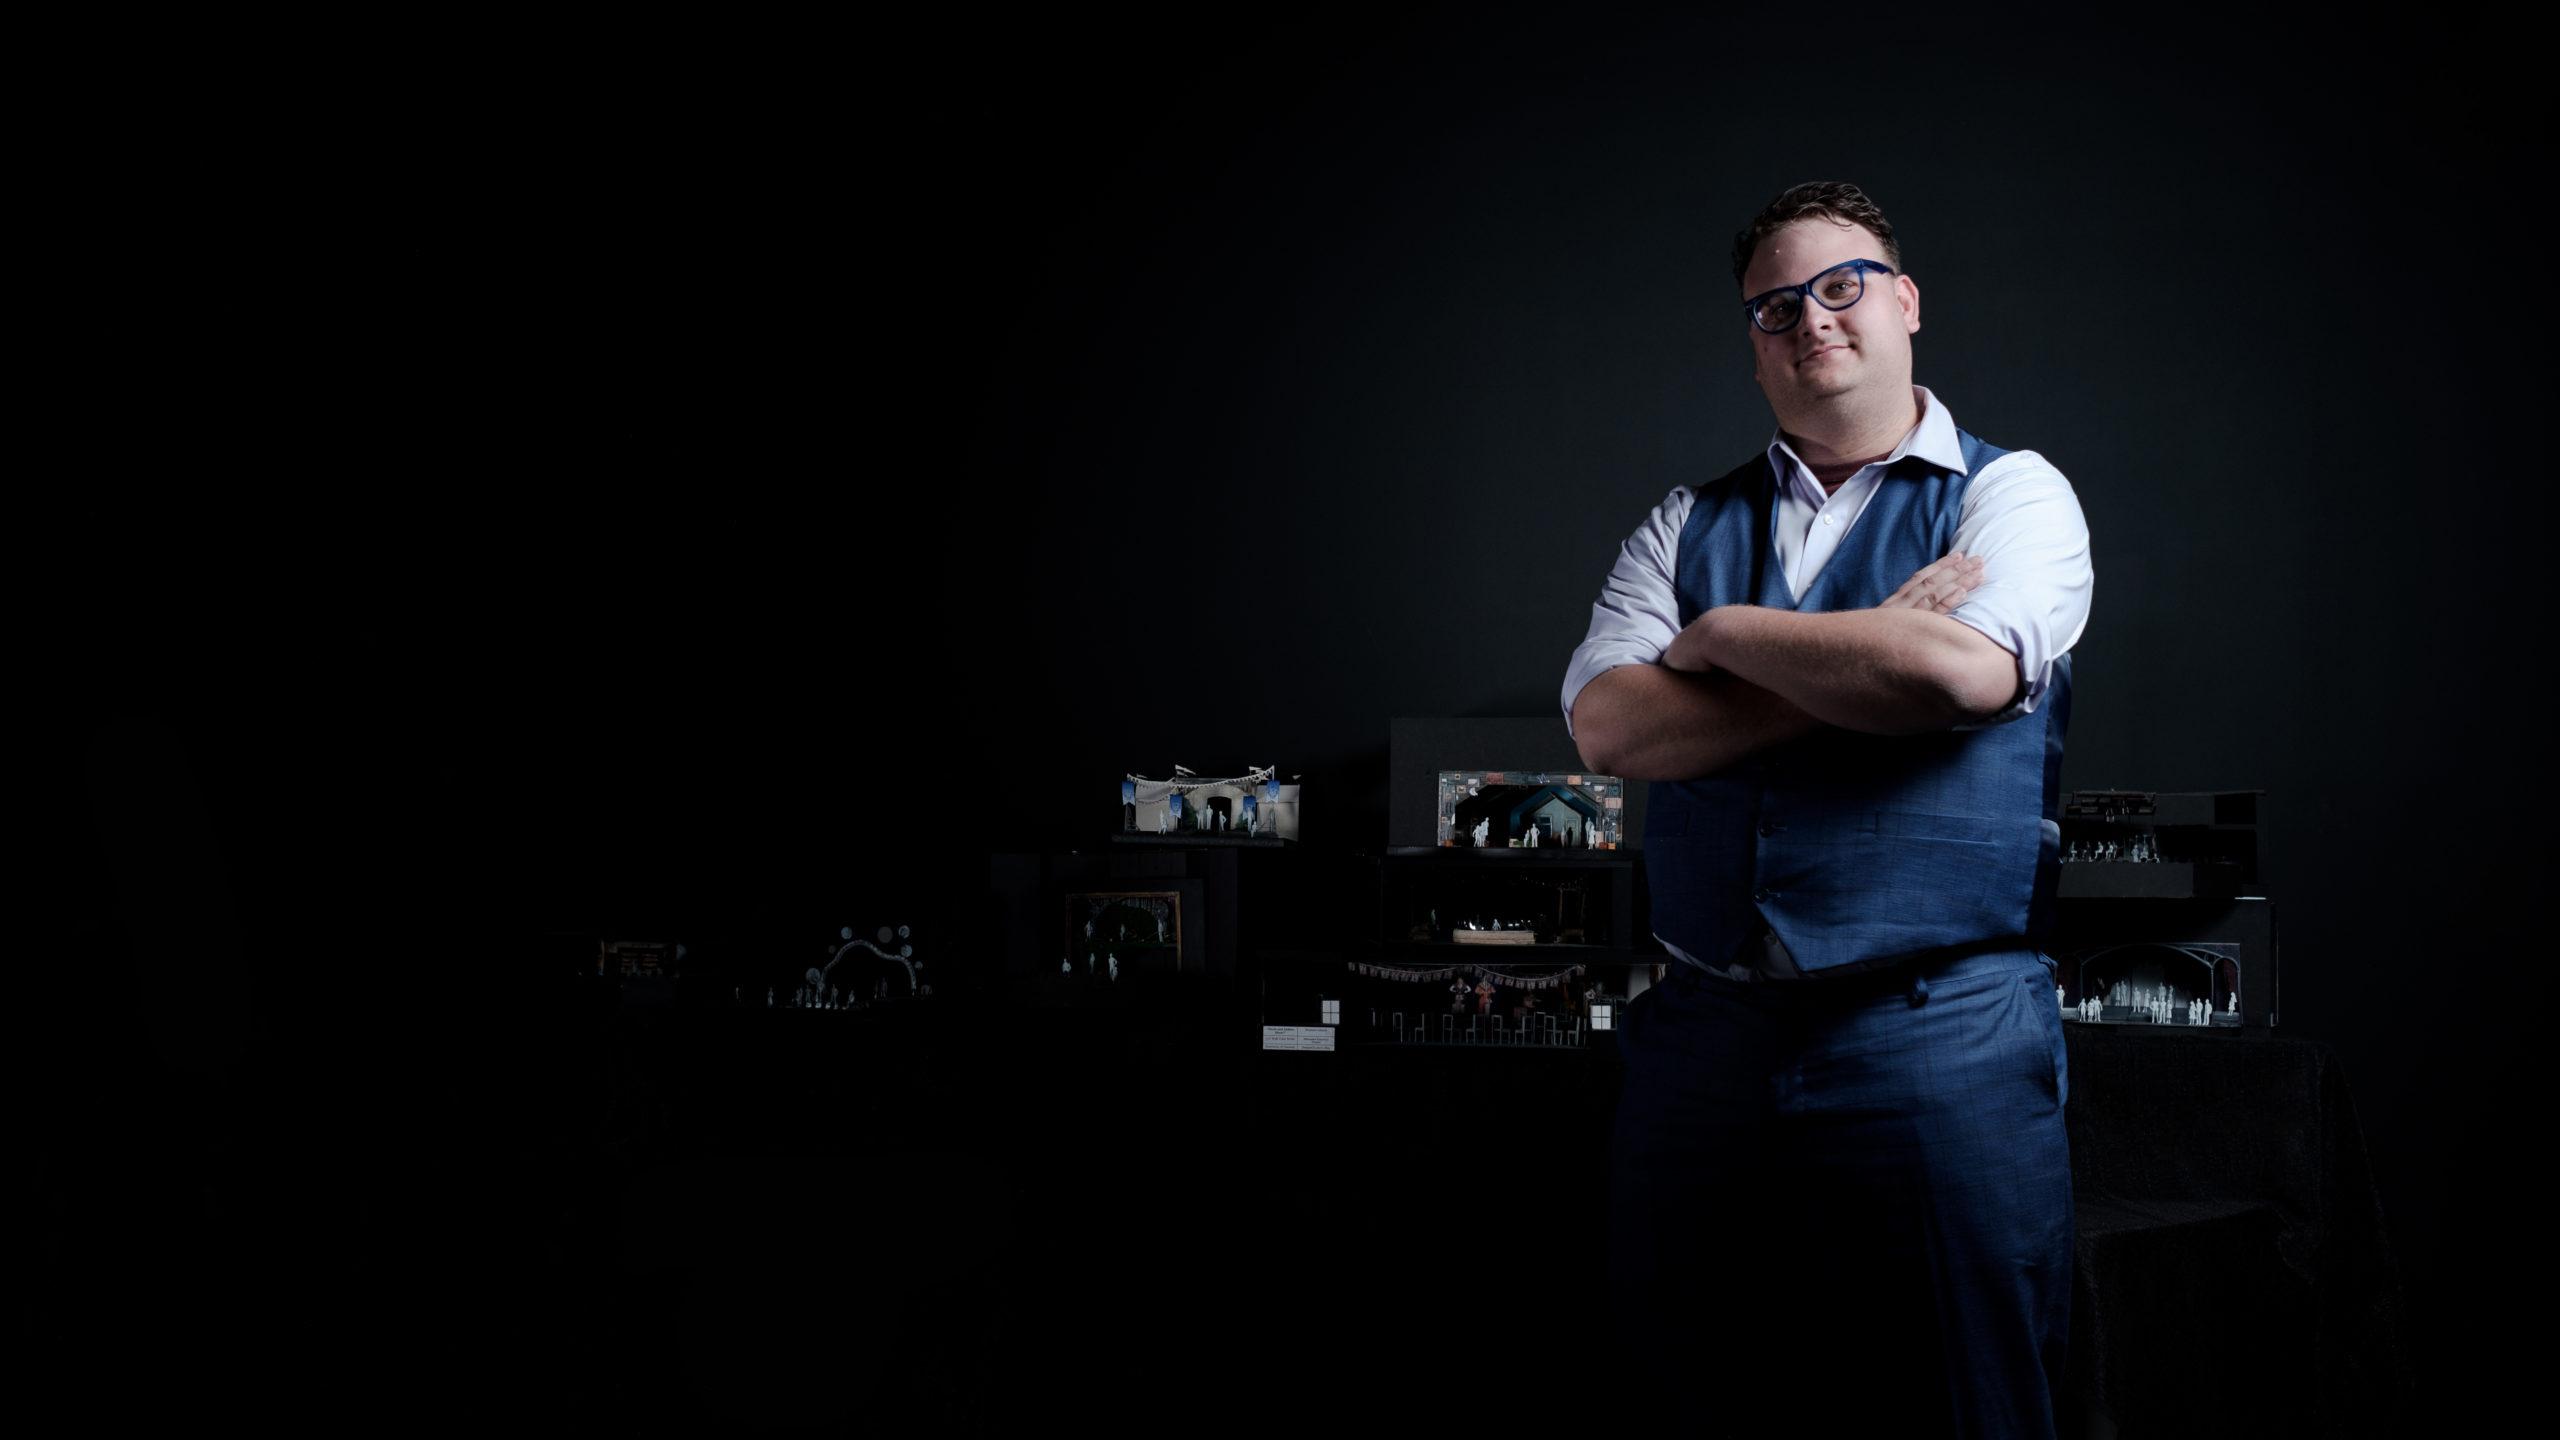 TFTV's Joe Klug named USITT Rising Star